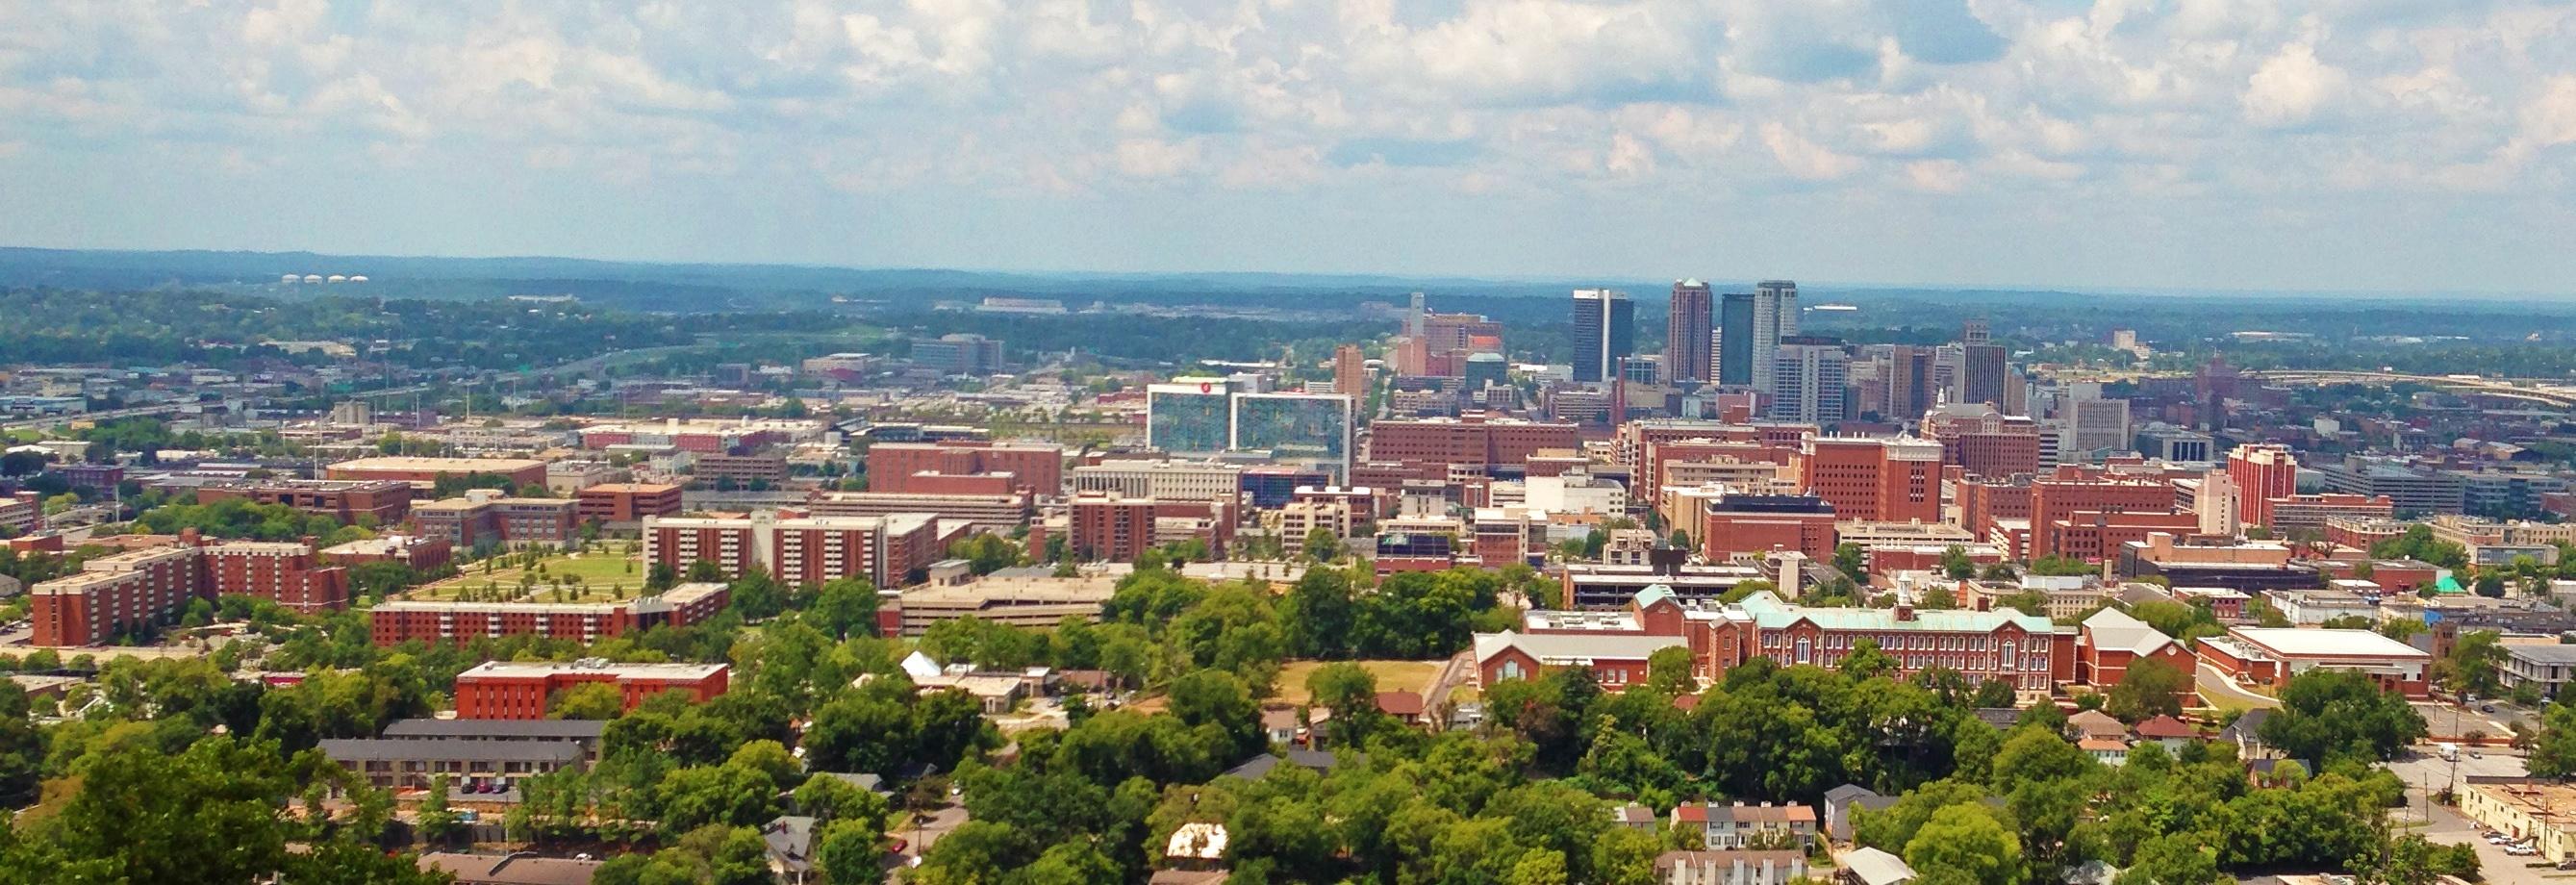 University_of_Alabama_at_Birmingham_Campus_from_Vulcan-3